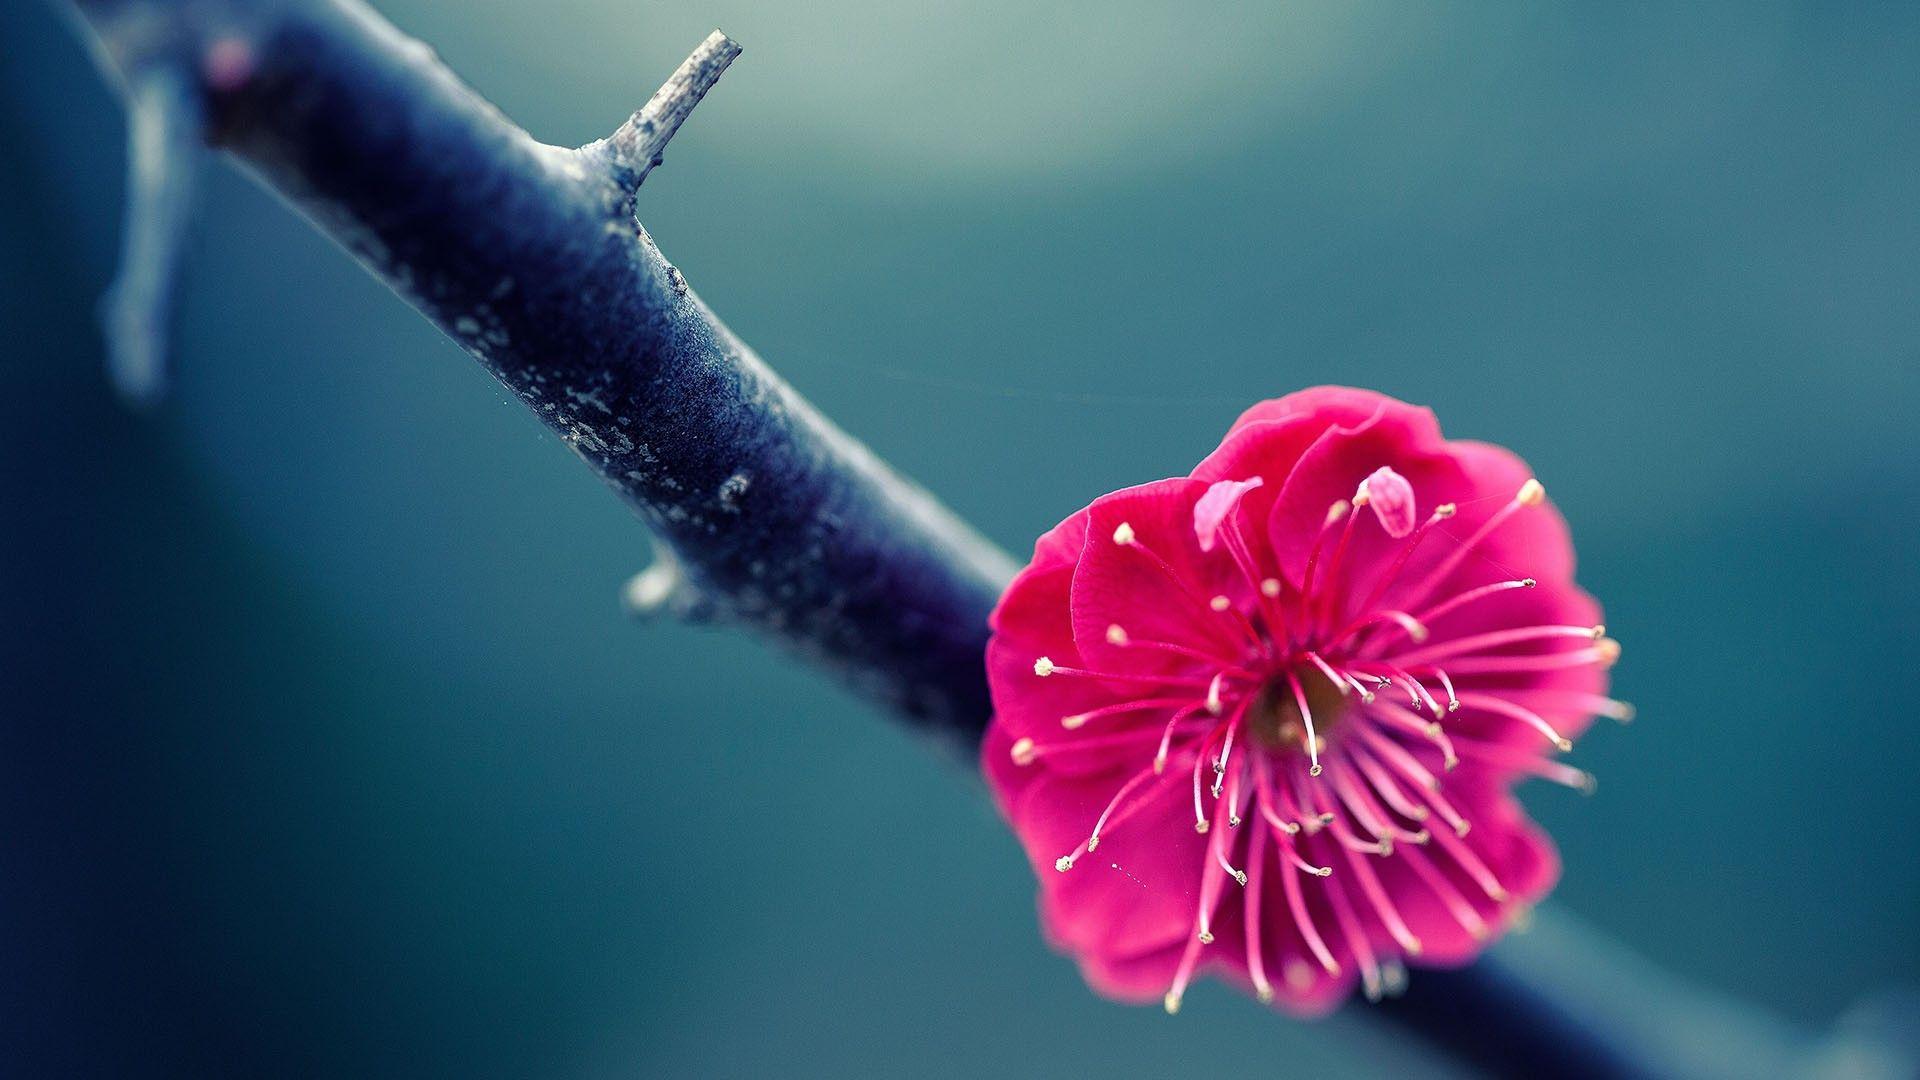 Flower Flowers Nature Beautiful Pretty Blue Macro Wallpaper Iphone